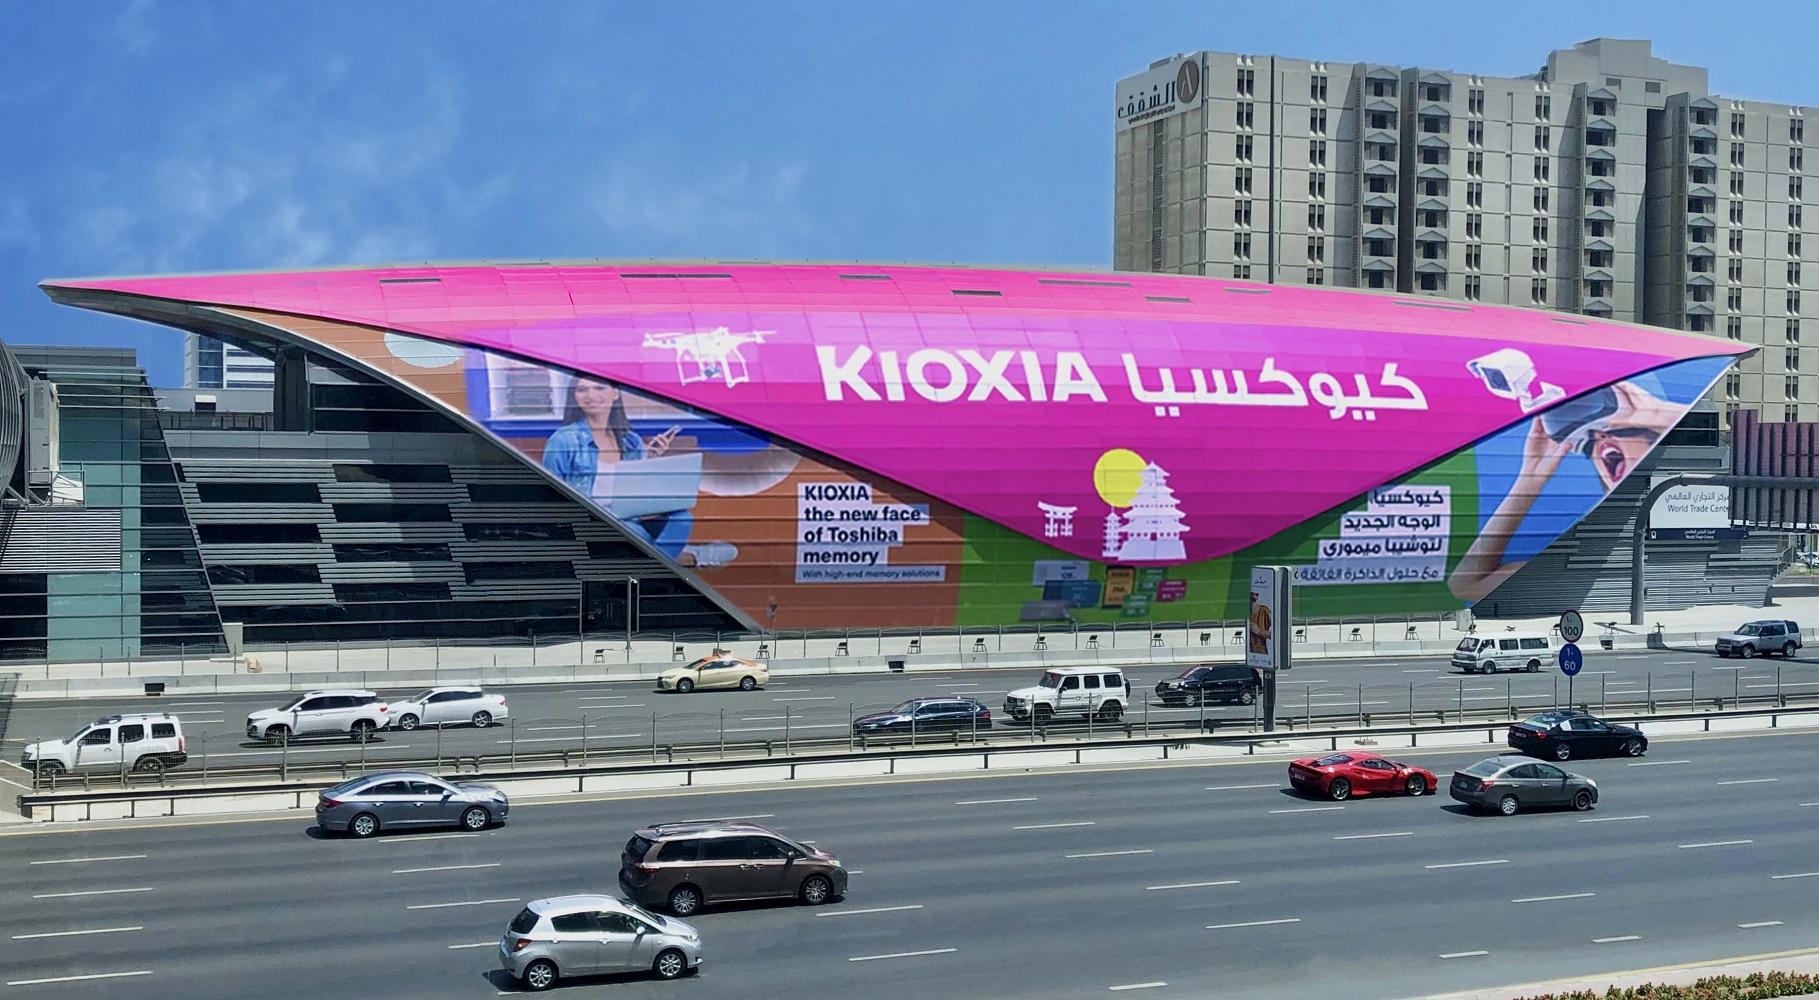 rta-hypermedia-sign-10-year-partnership-agreement-to-manage-metro-advertising